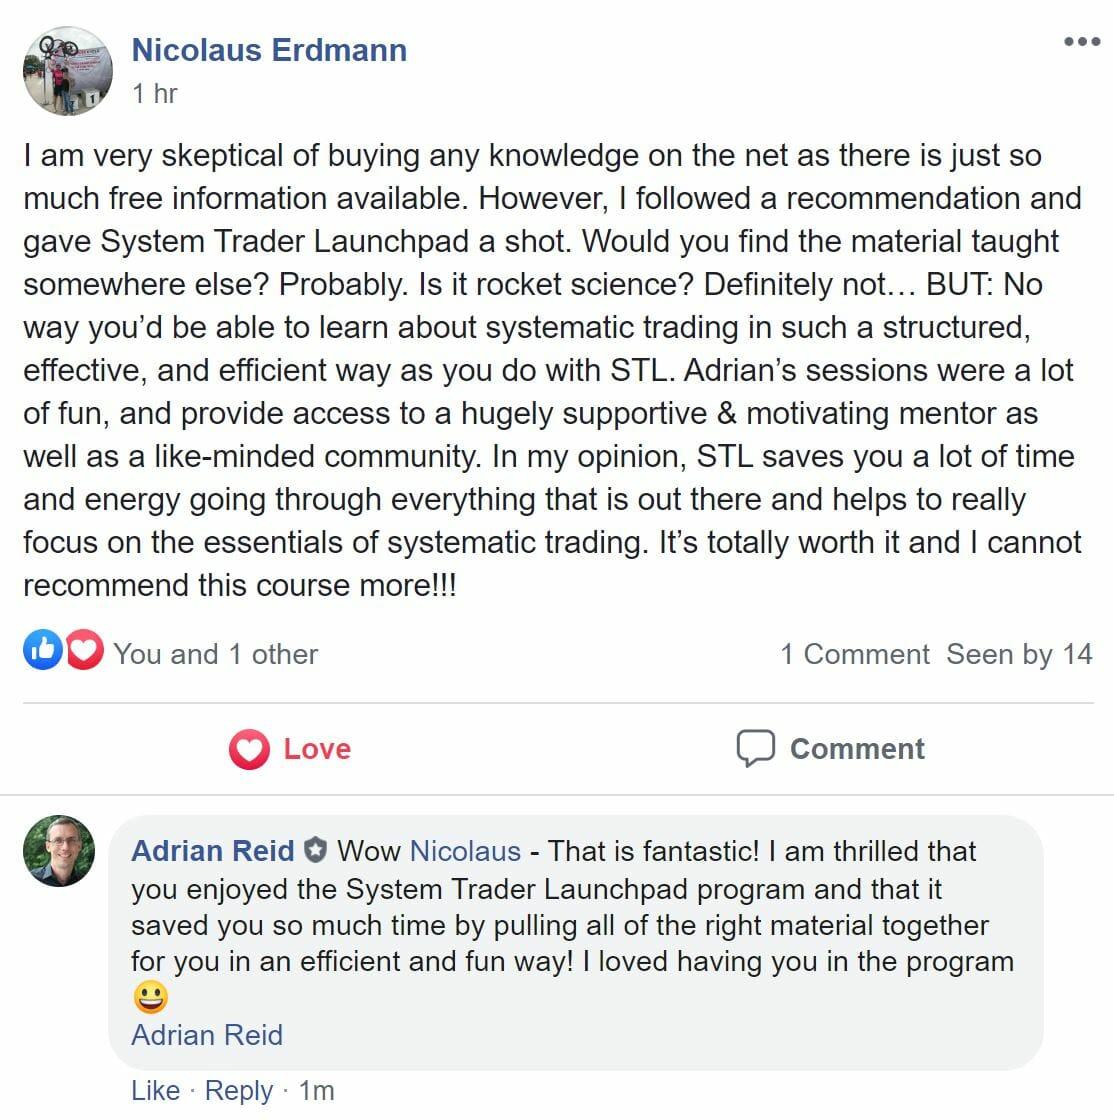 Nicolaus Erdmann - Testimonial for System Trader Launchpad